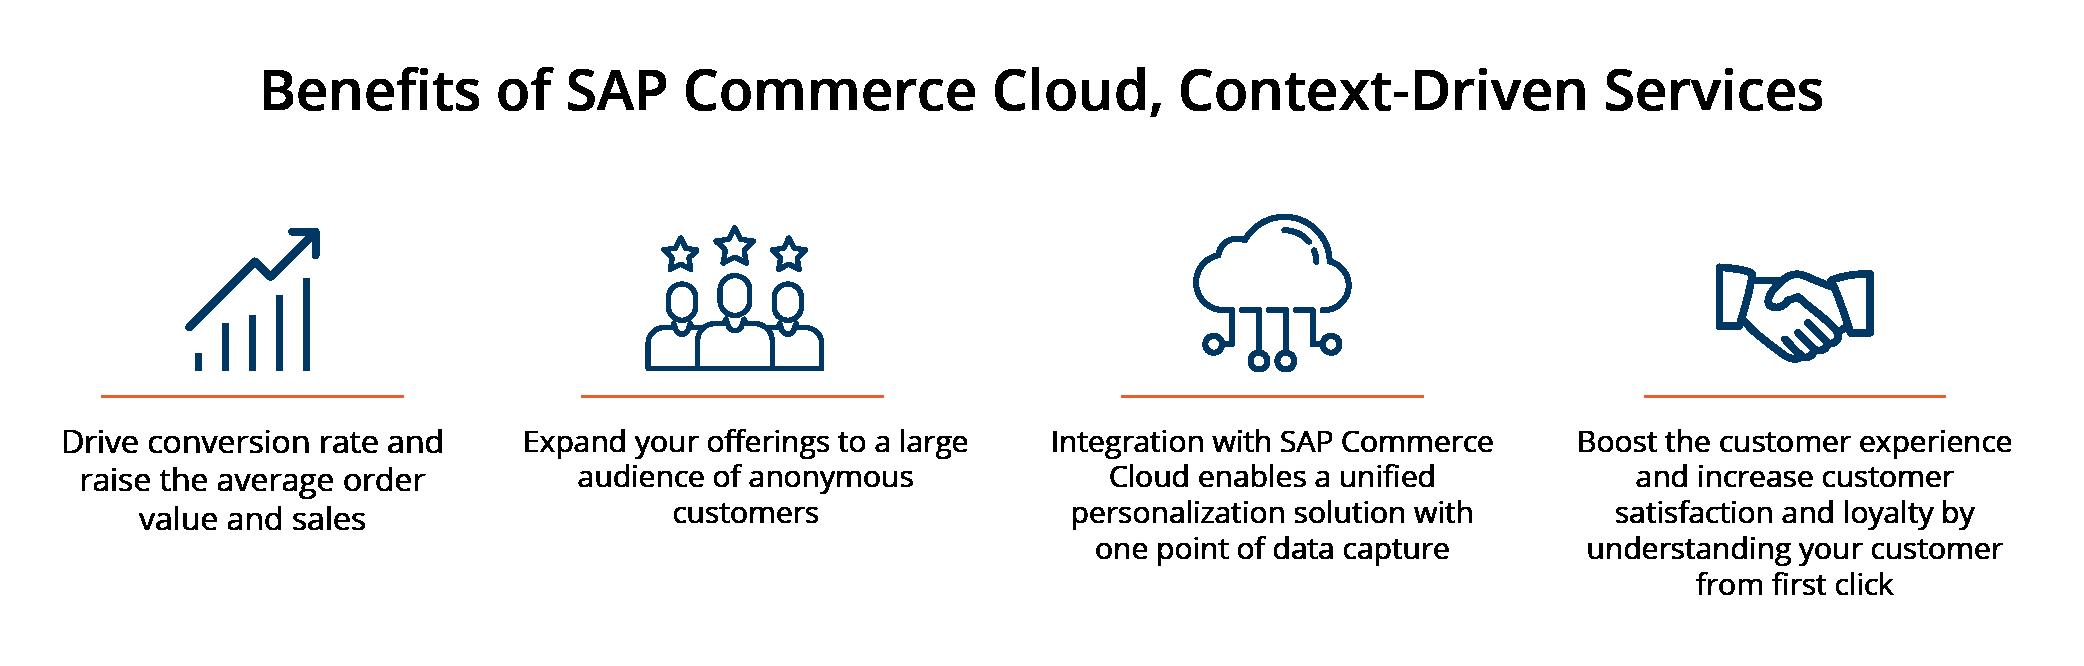 Benefits of SAP Commerce Cloud